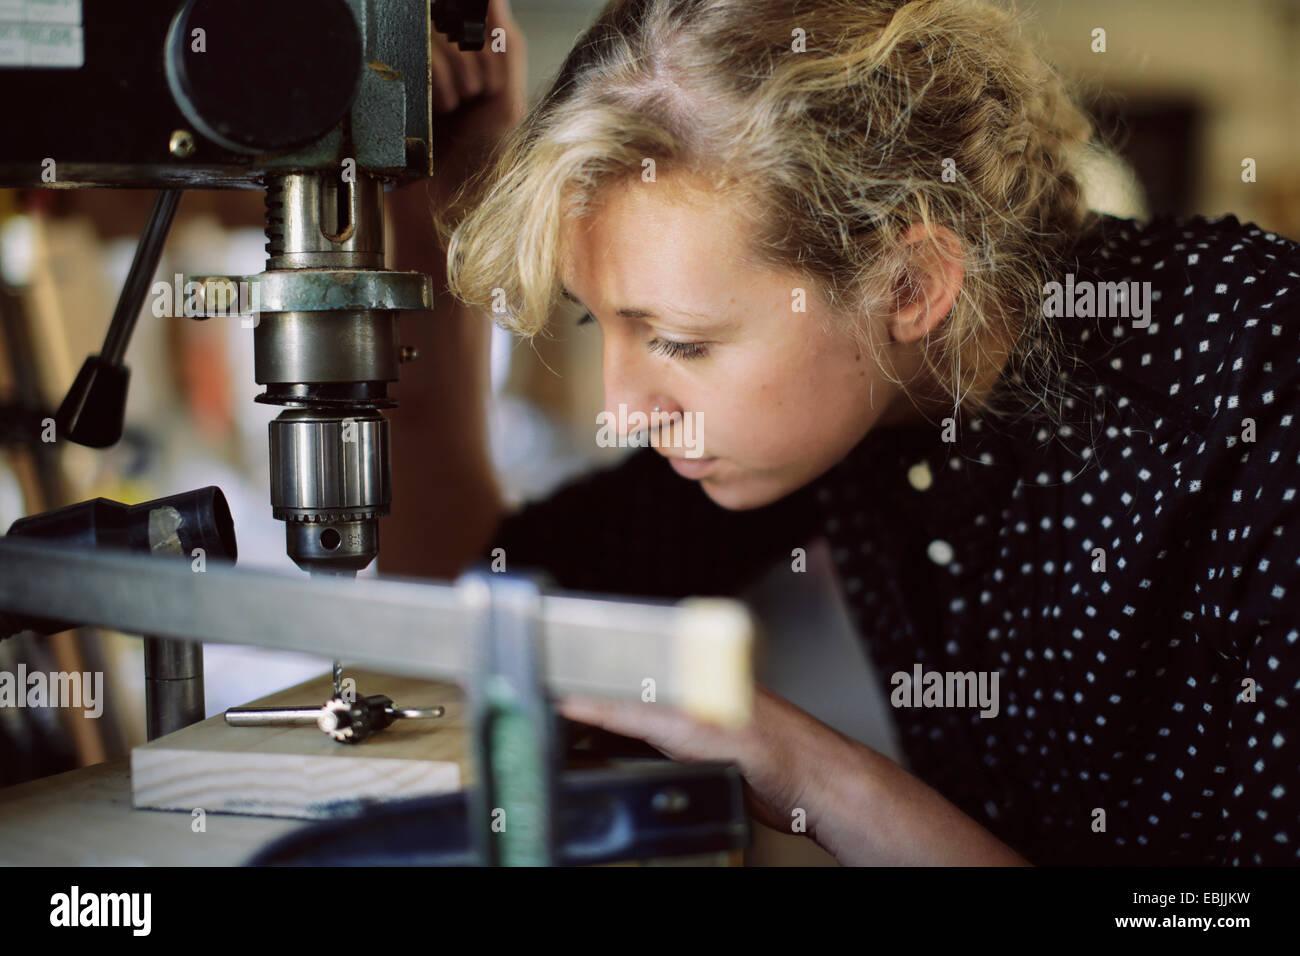 Joven artesana de perforación en componente PIPE ORGAN TALLER Imagen De Stock